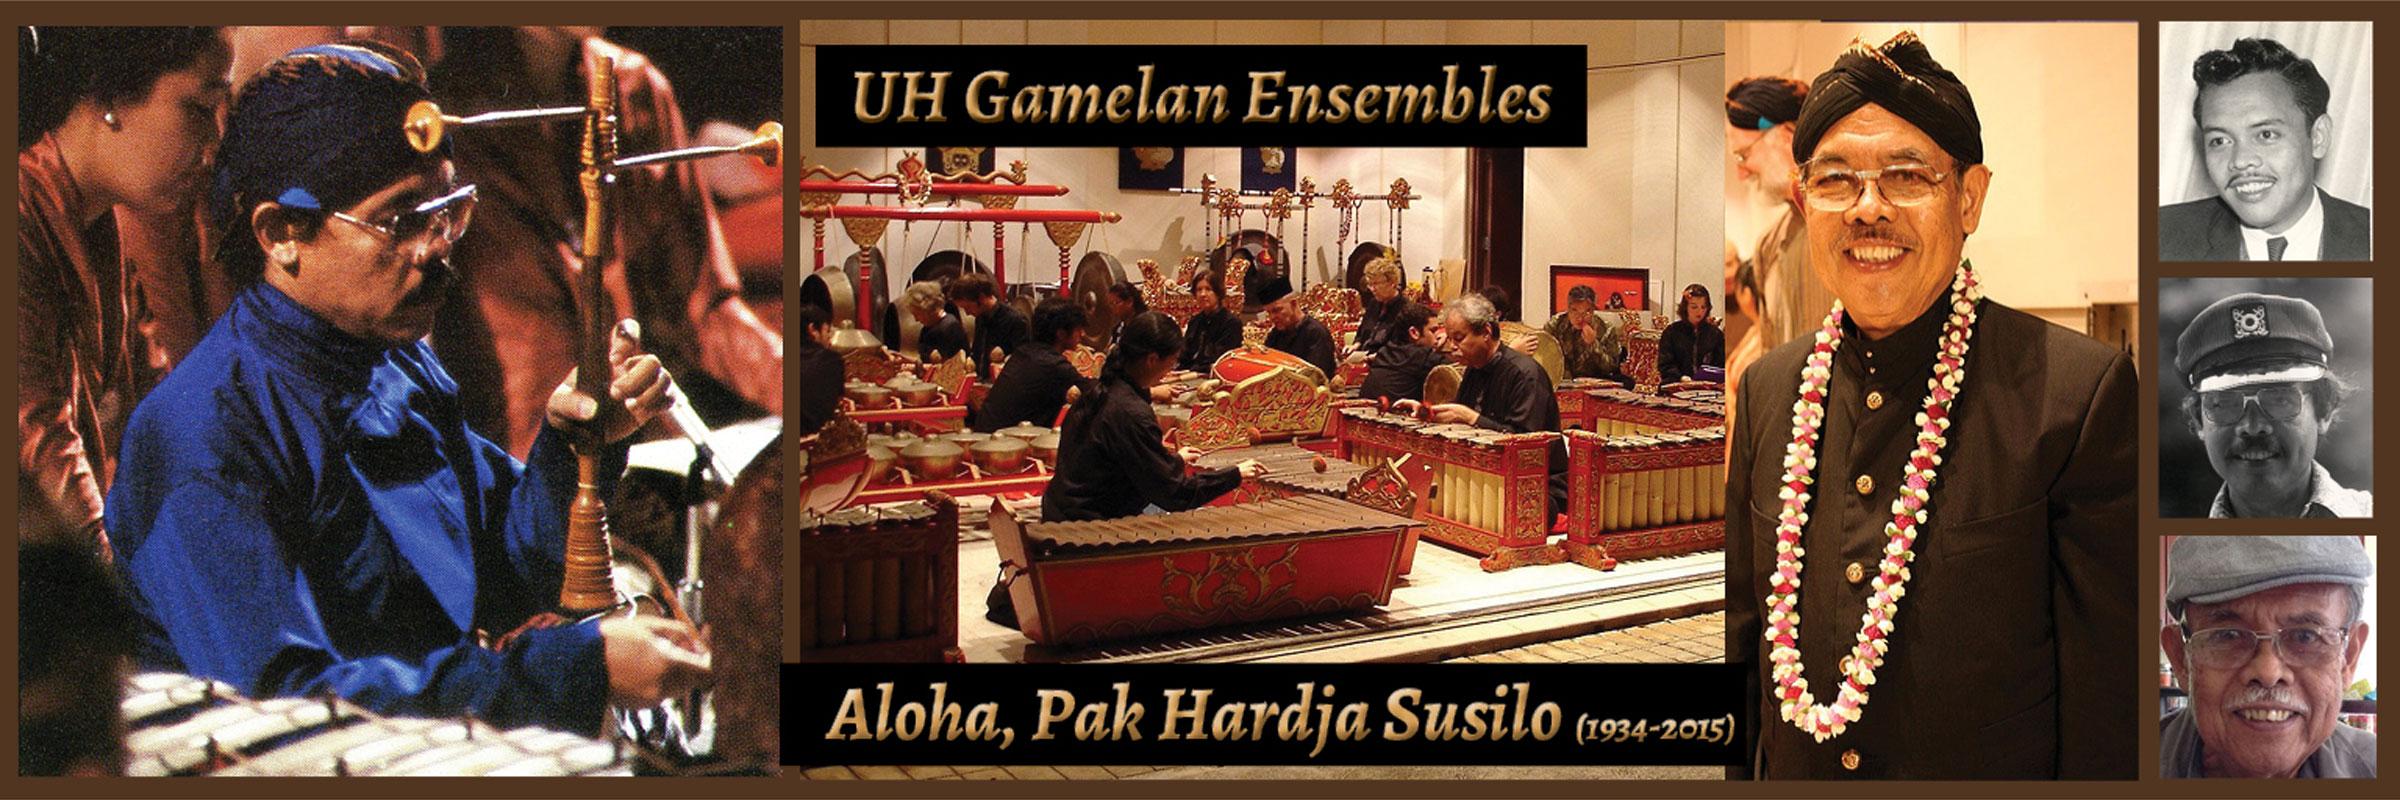 collage of images of Pak Hardja Susilo and gamelan instruments